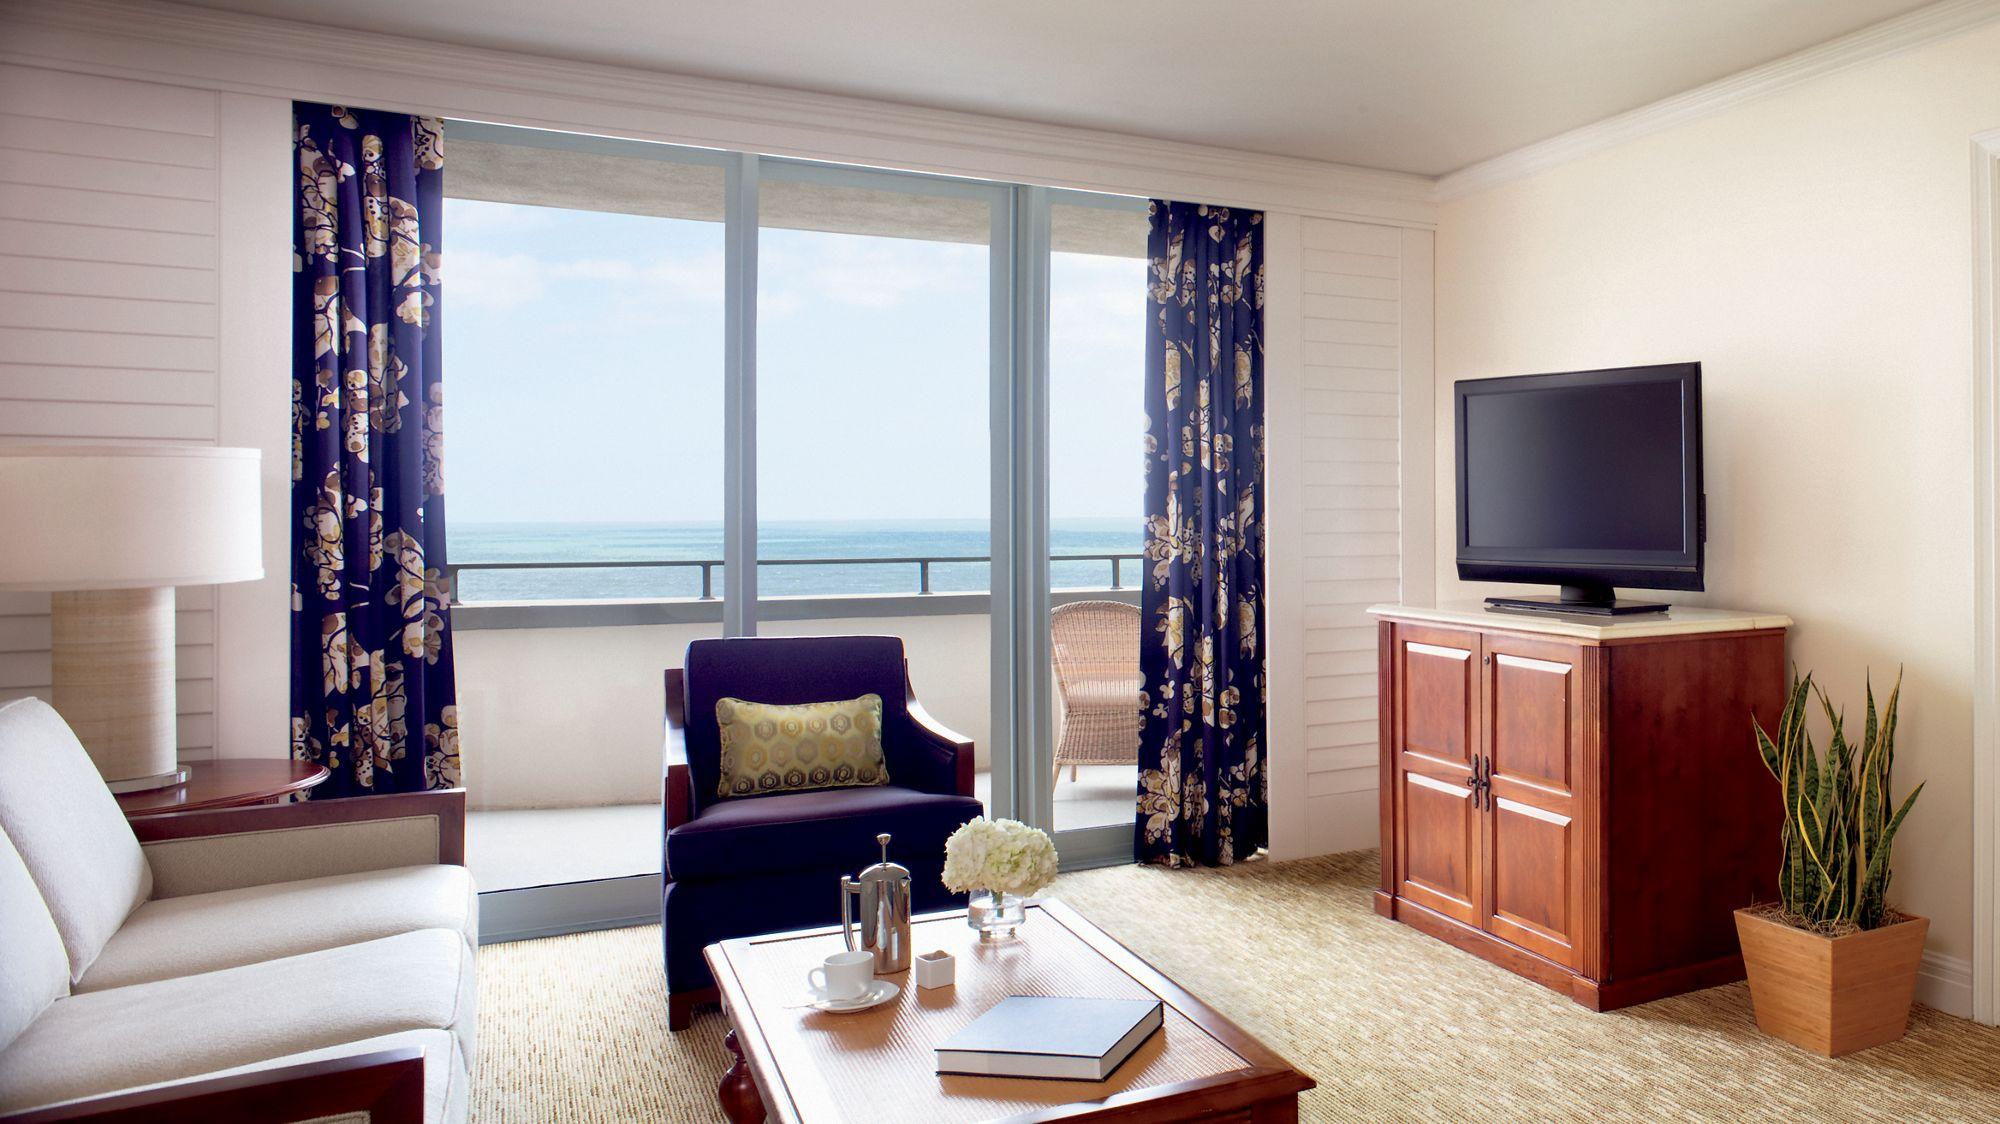 Ocean View Suite in Florida | The Ritz-Carlton, Amelia Island